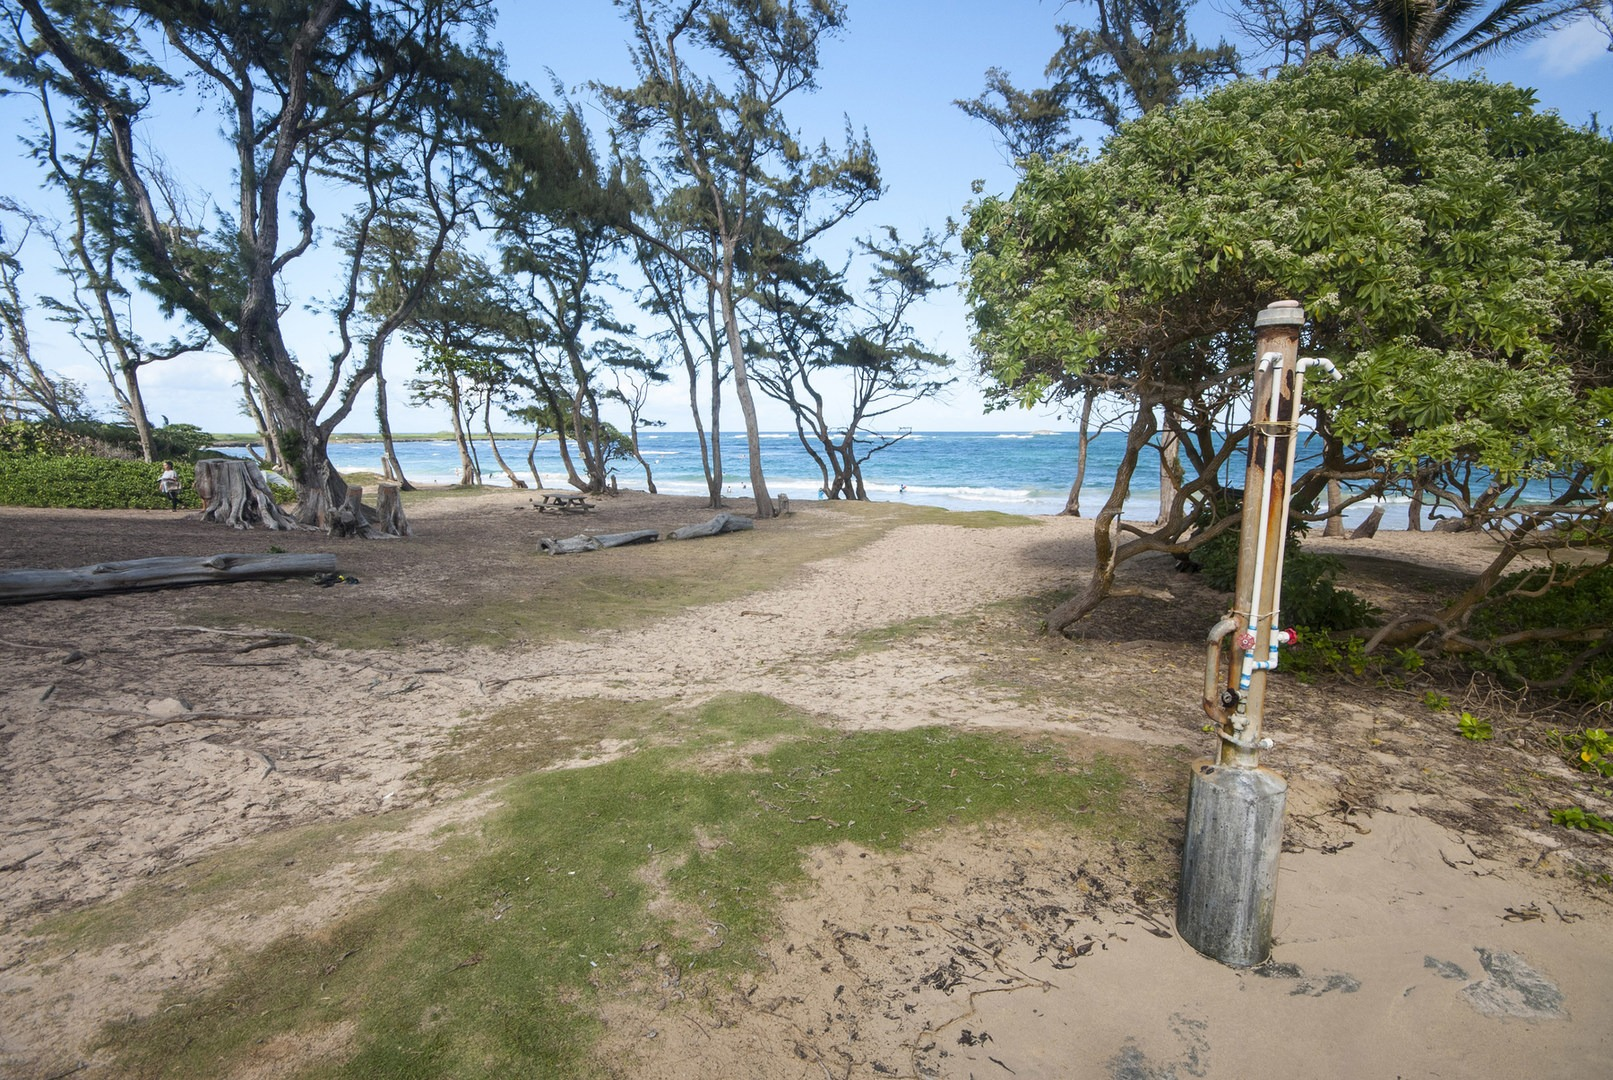 Mālaekahana Beach Campground Tent Camping Area And Outdoor Shower At